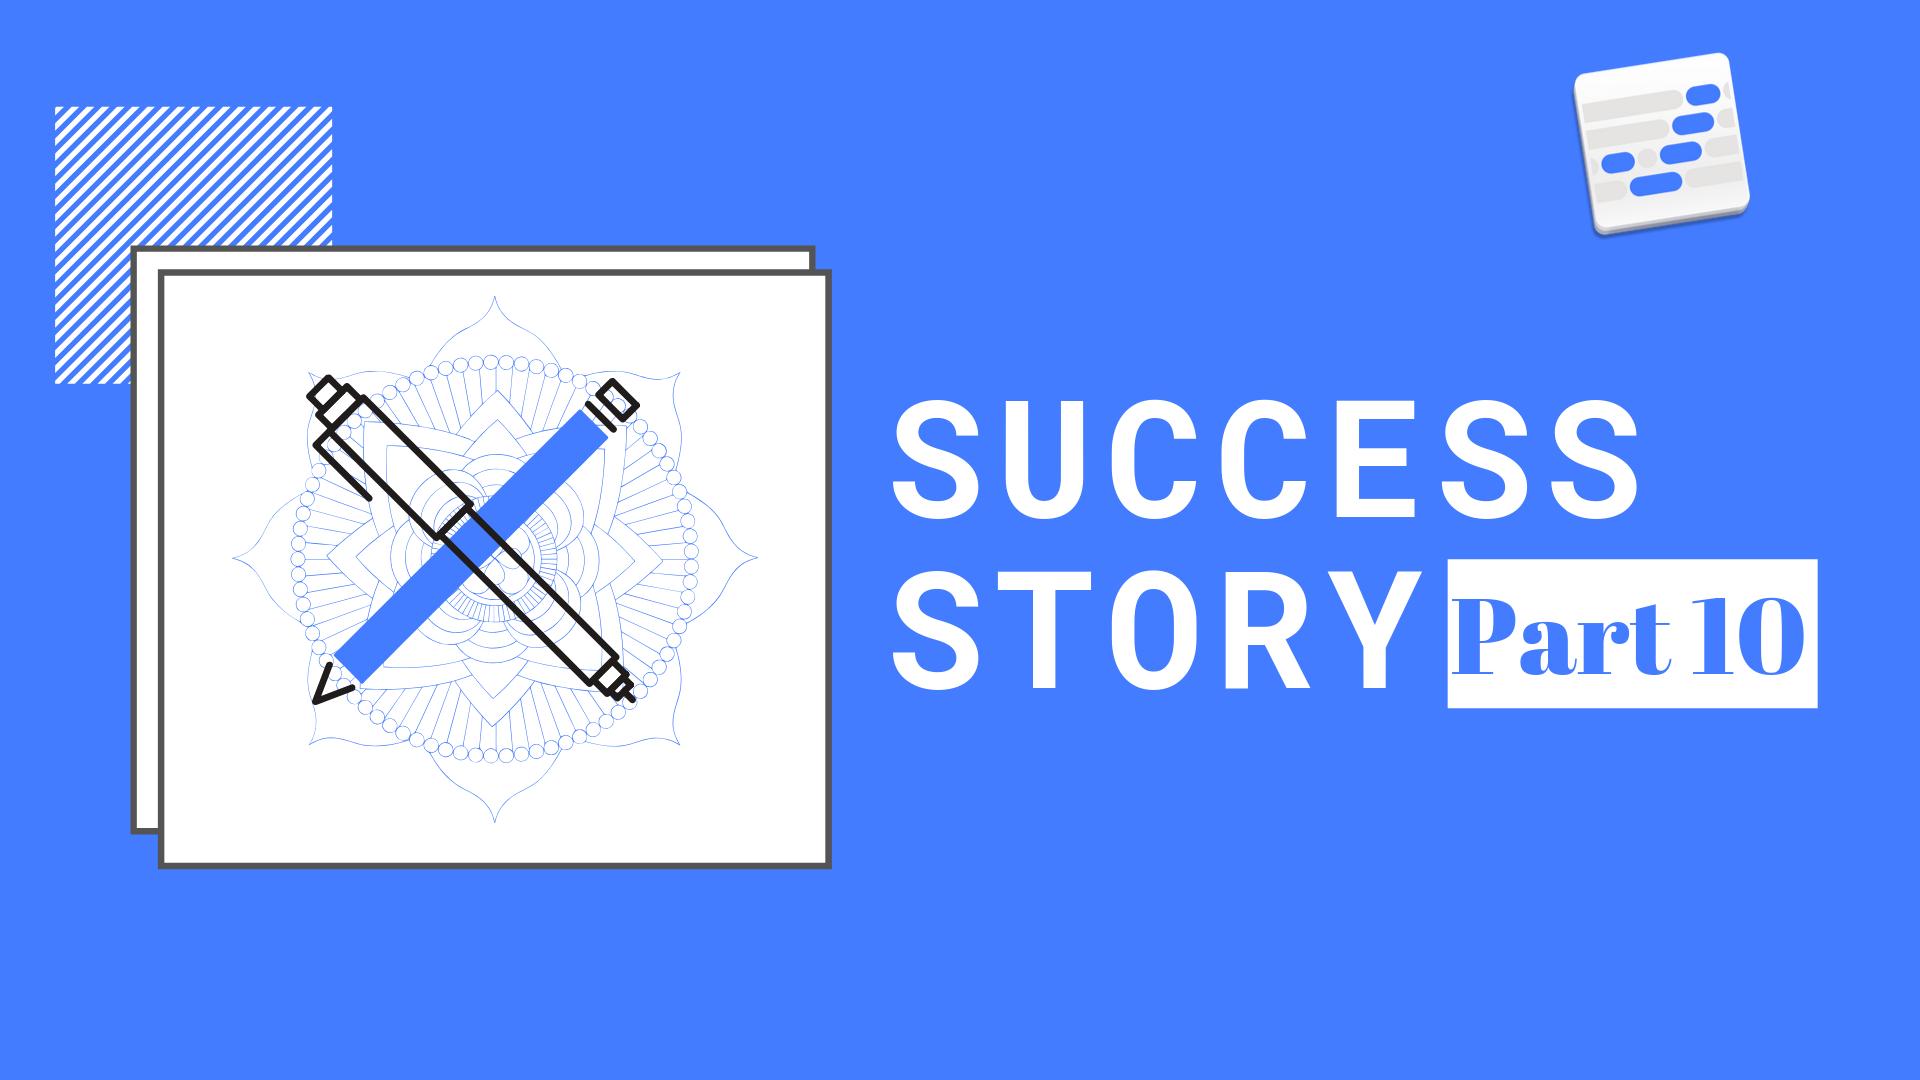 Professor Success Story